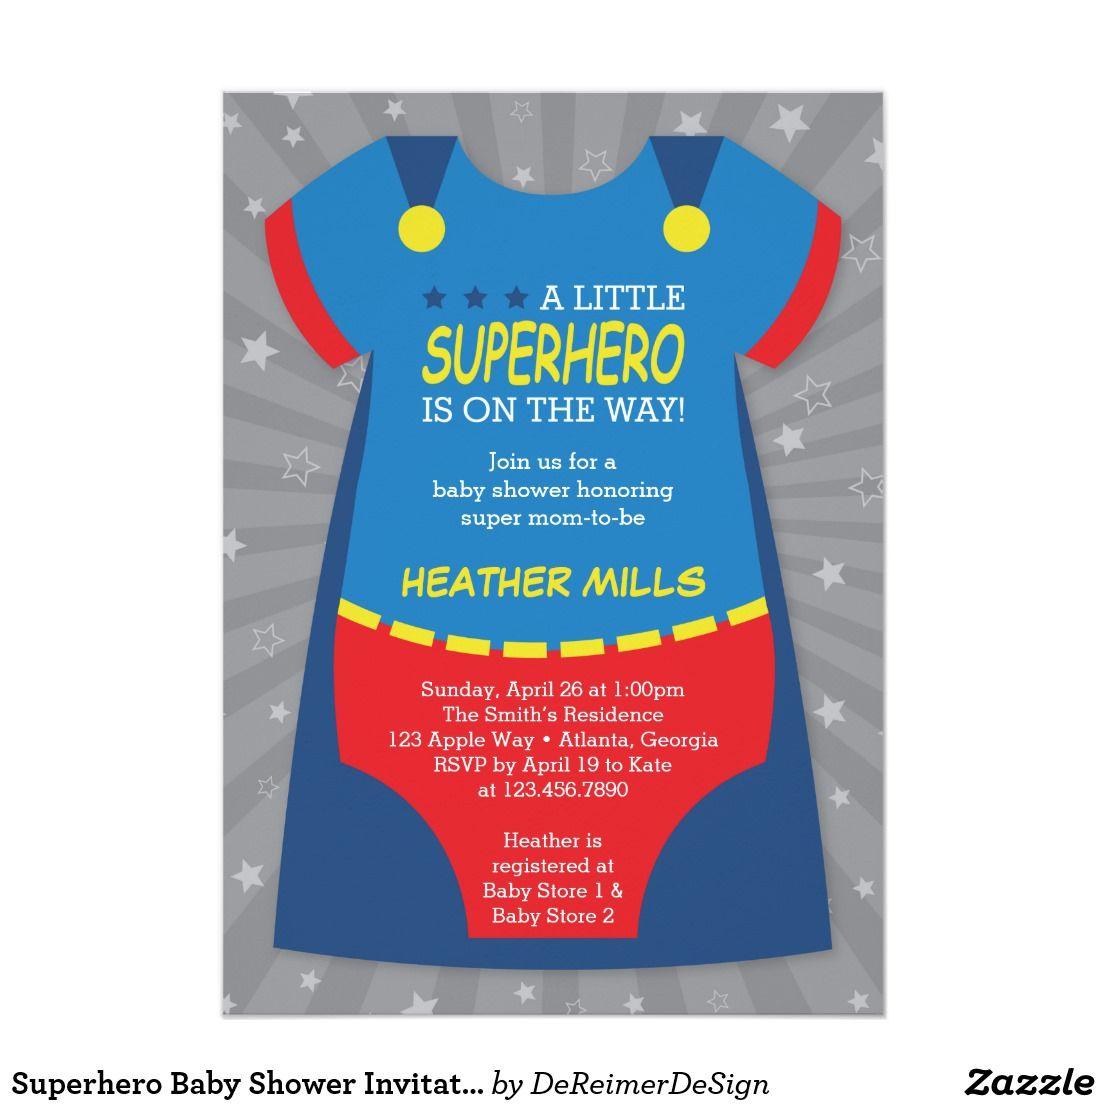 Superhero Baby Shower Invitation, Blue, Red Card Celebrate the ...